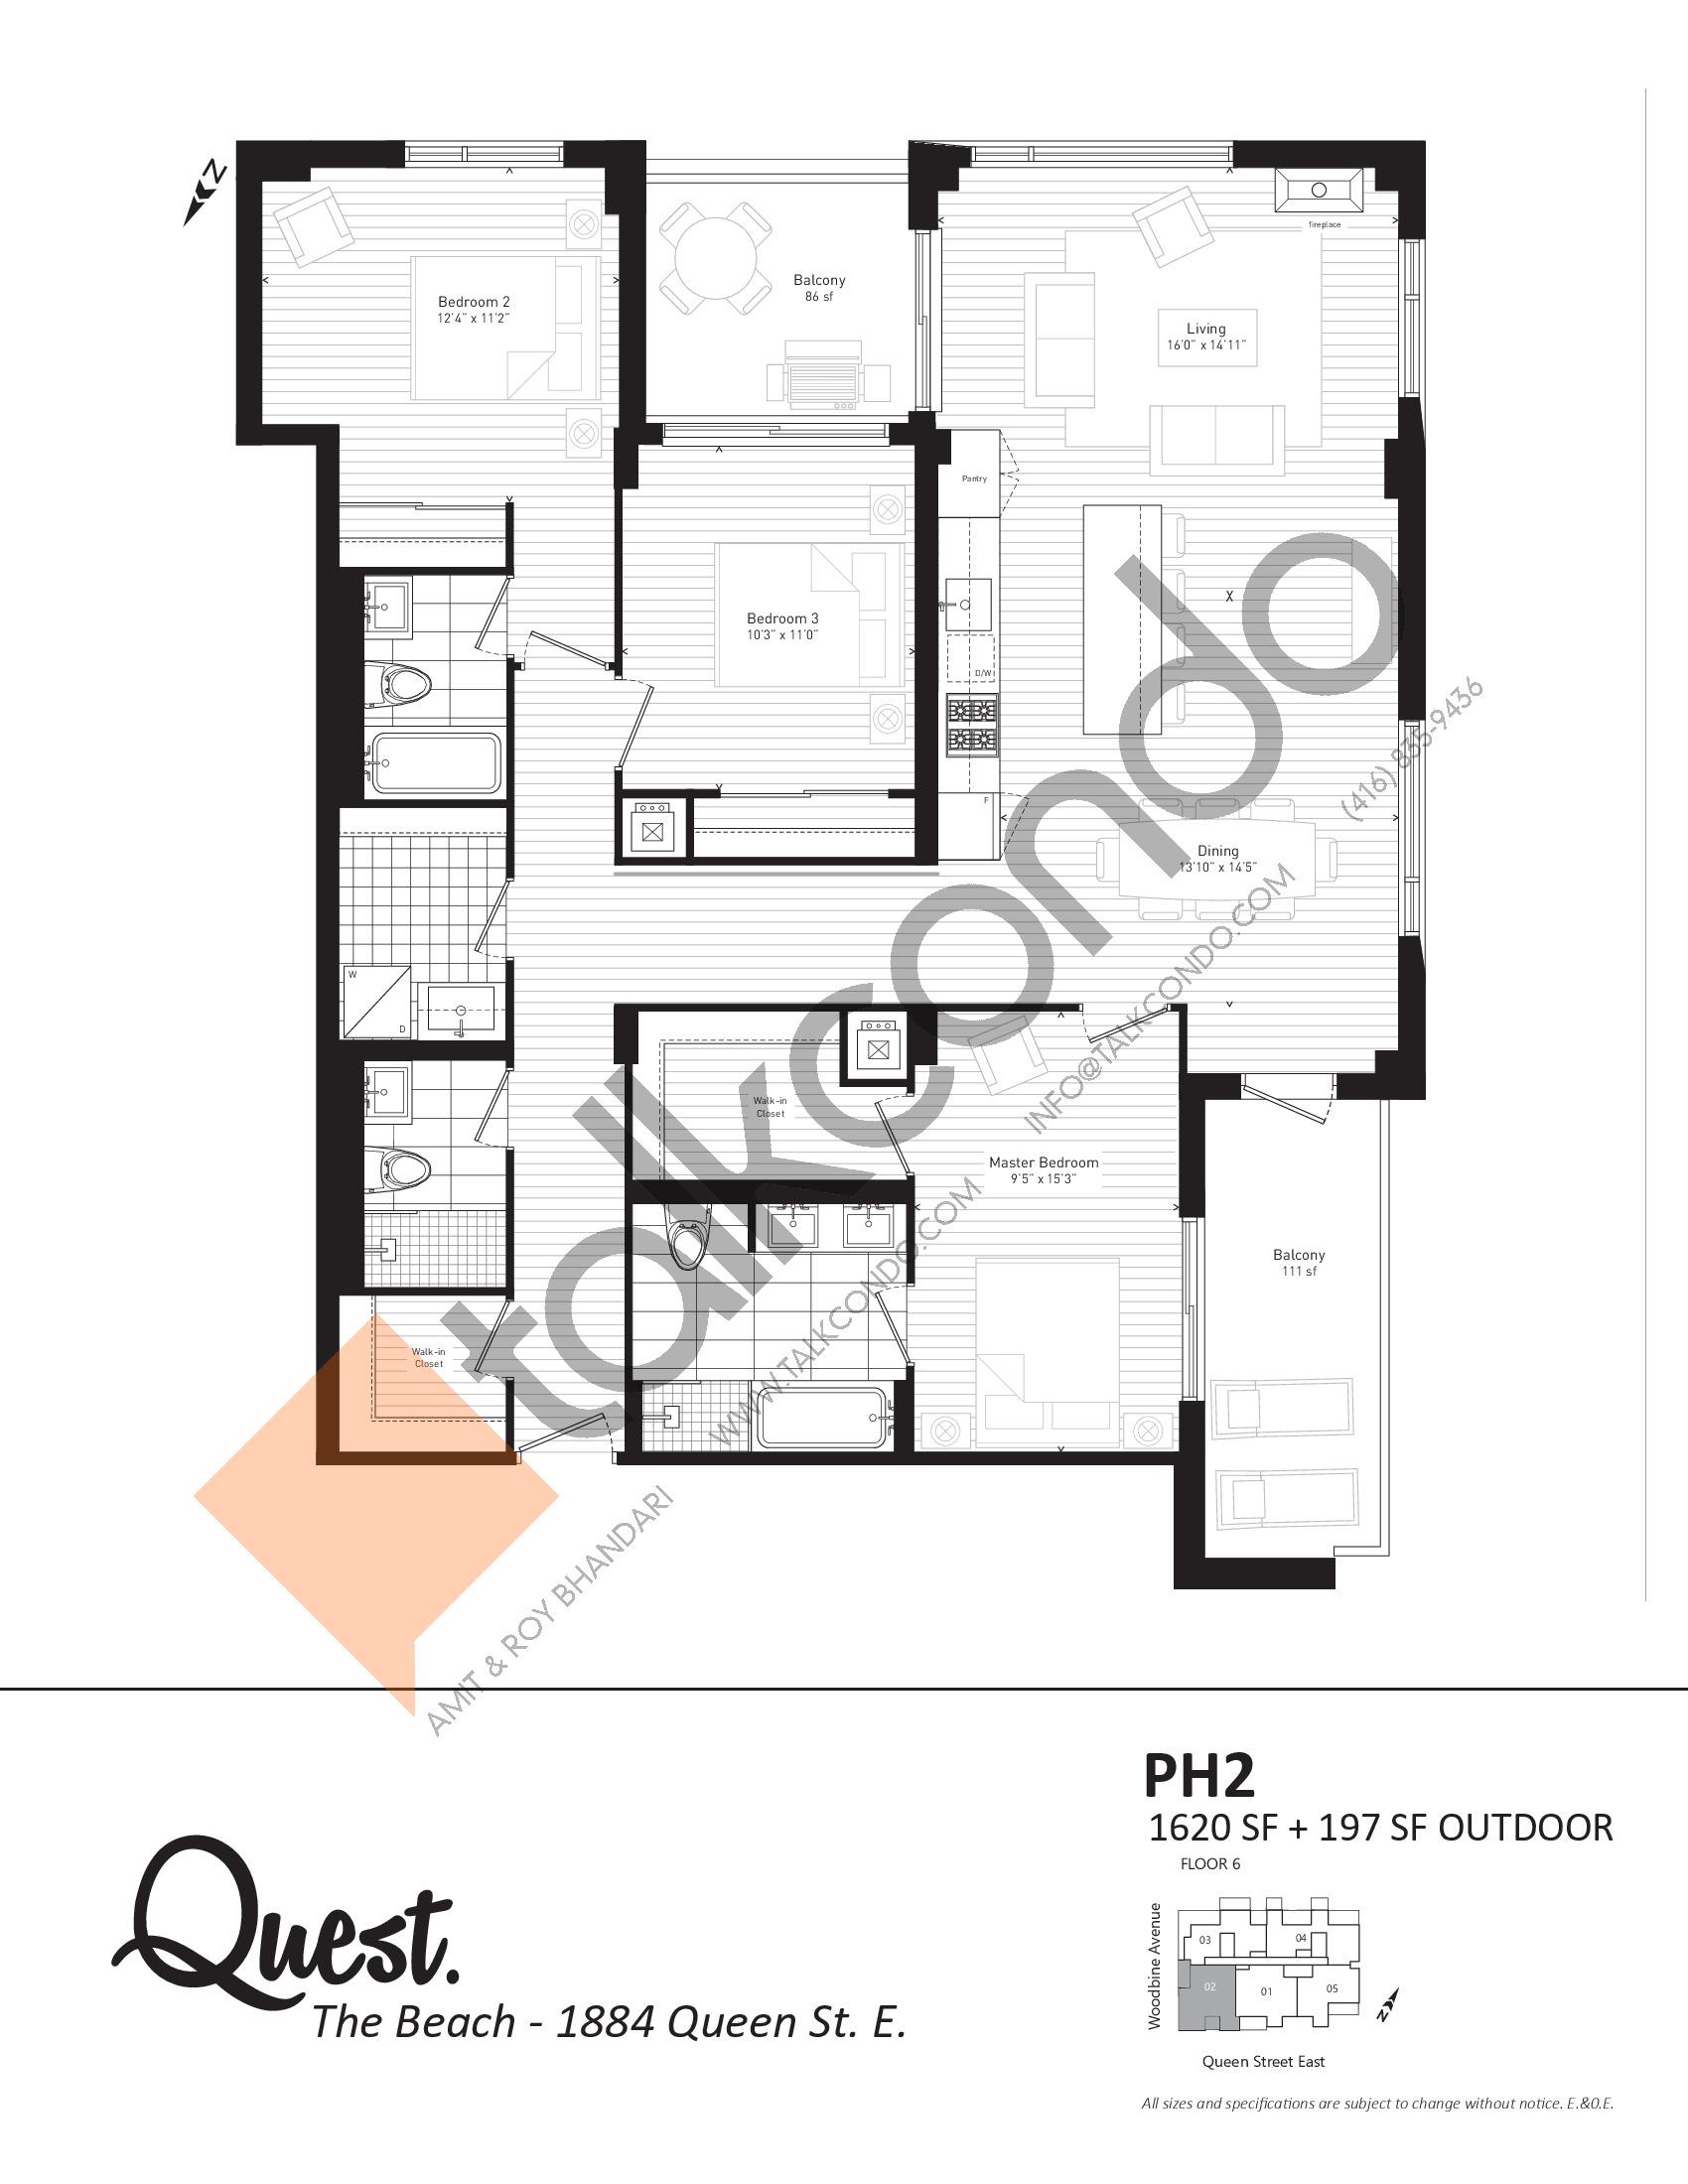 PH2 Floor Plan at Heartwood the Beach Condos - 1620 sq.ft